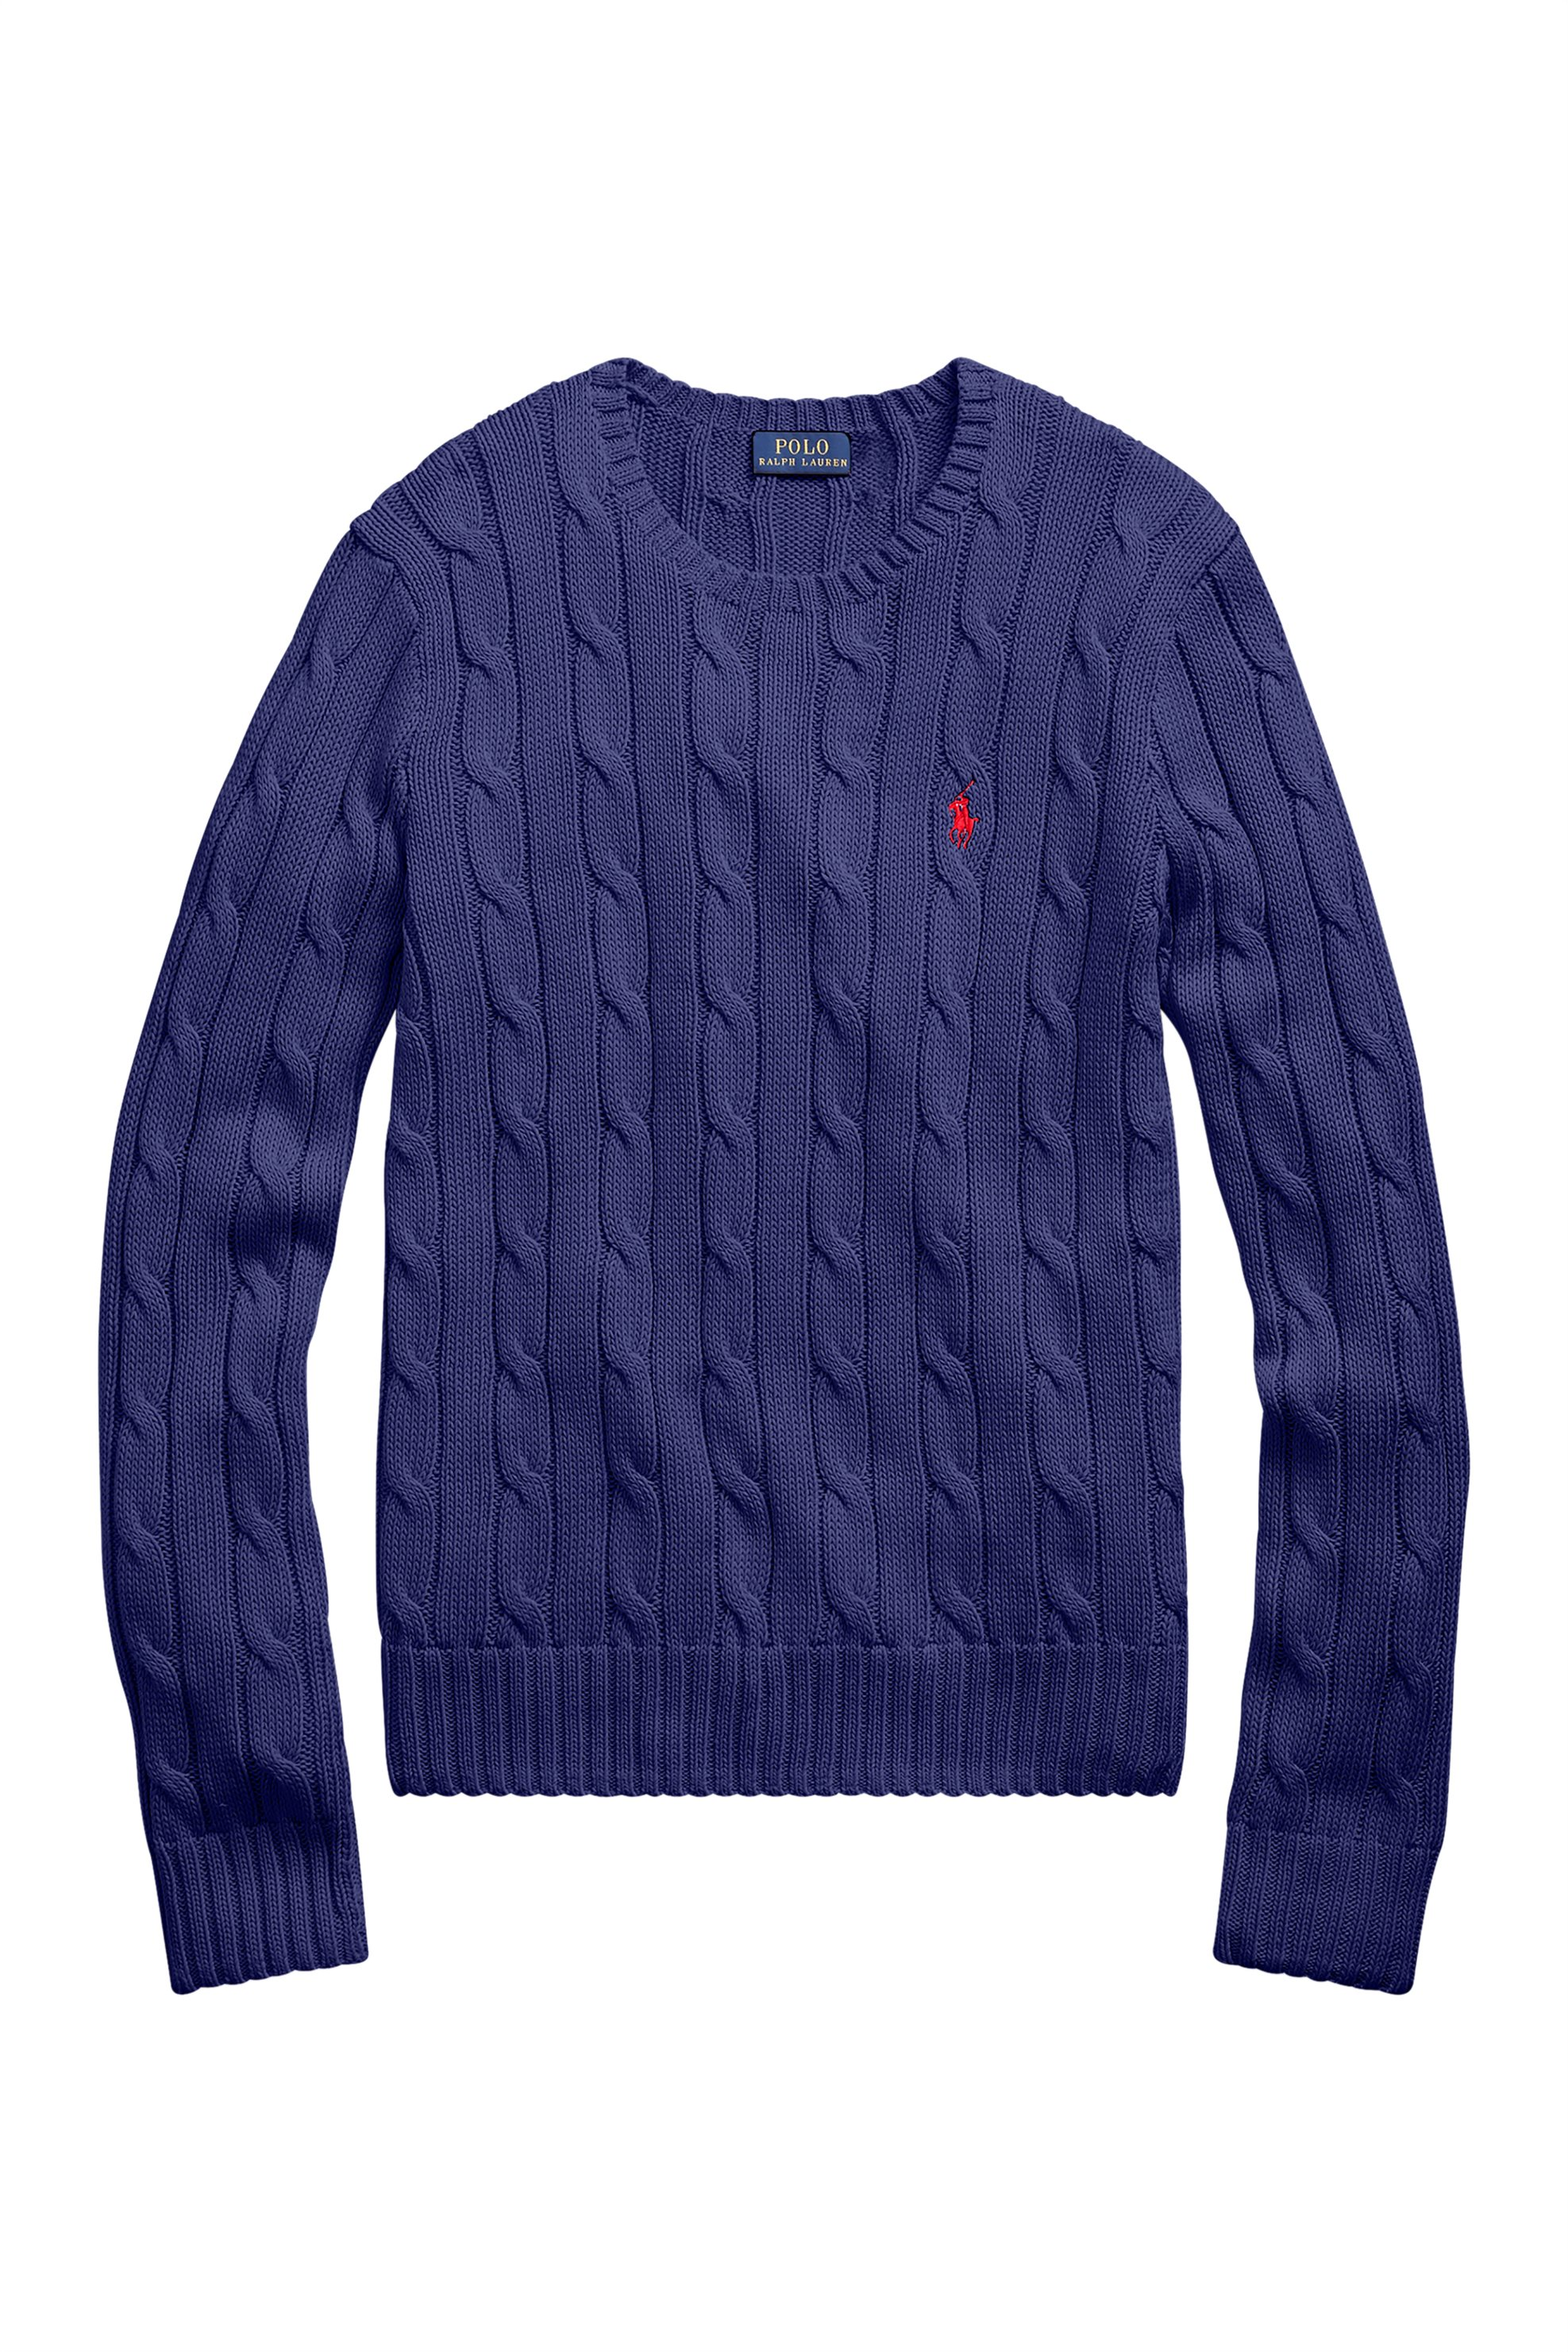 862127a31c82 Polo Ralph Lauren γυναικεία πλεκτή μπλούζα με σχέδιο πλεξούδες Cable-Knit -  211580009062 - Μπλε Σκούρο